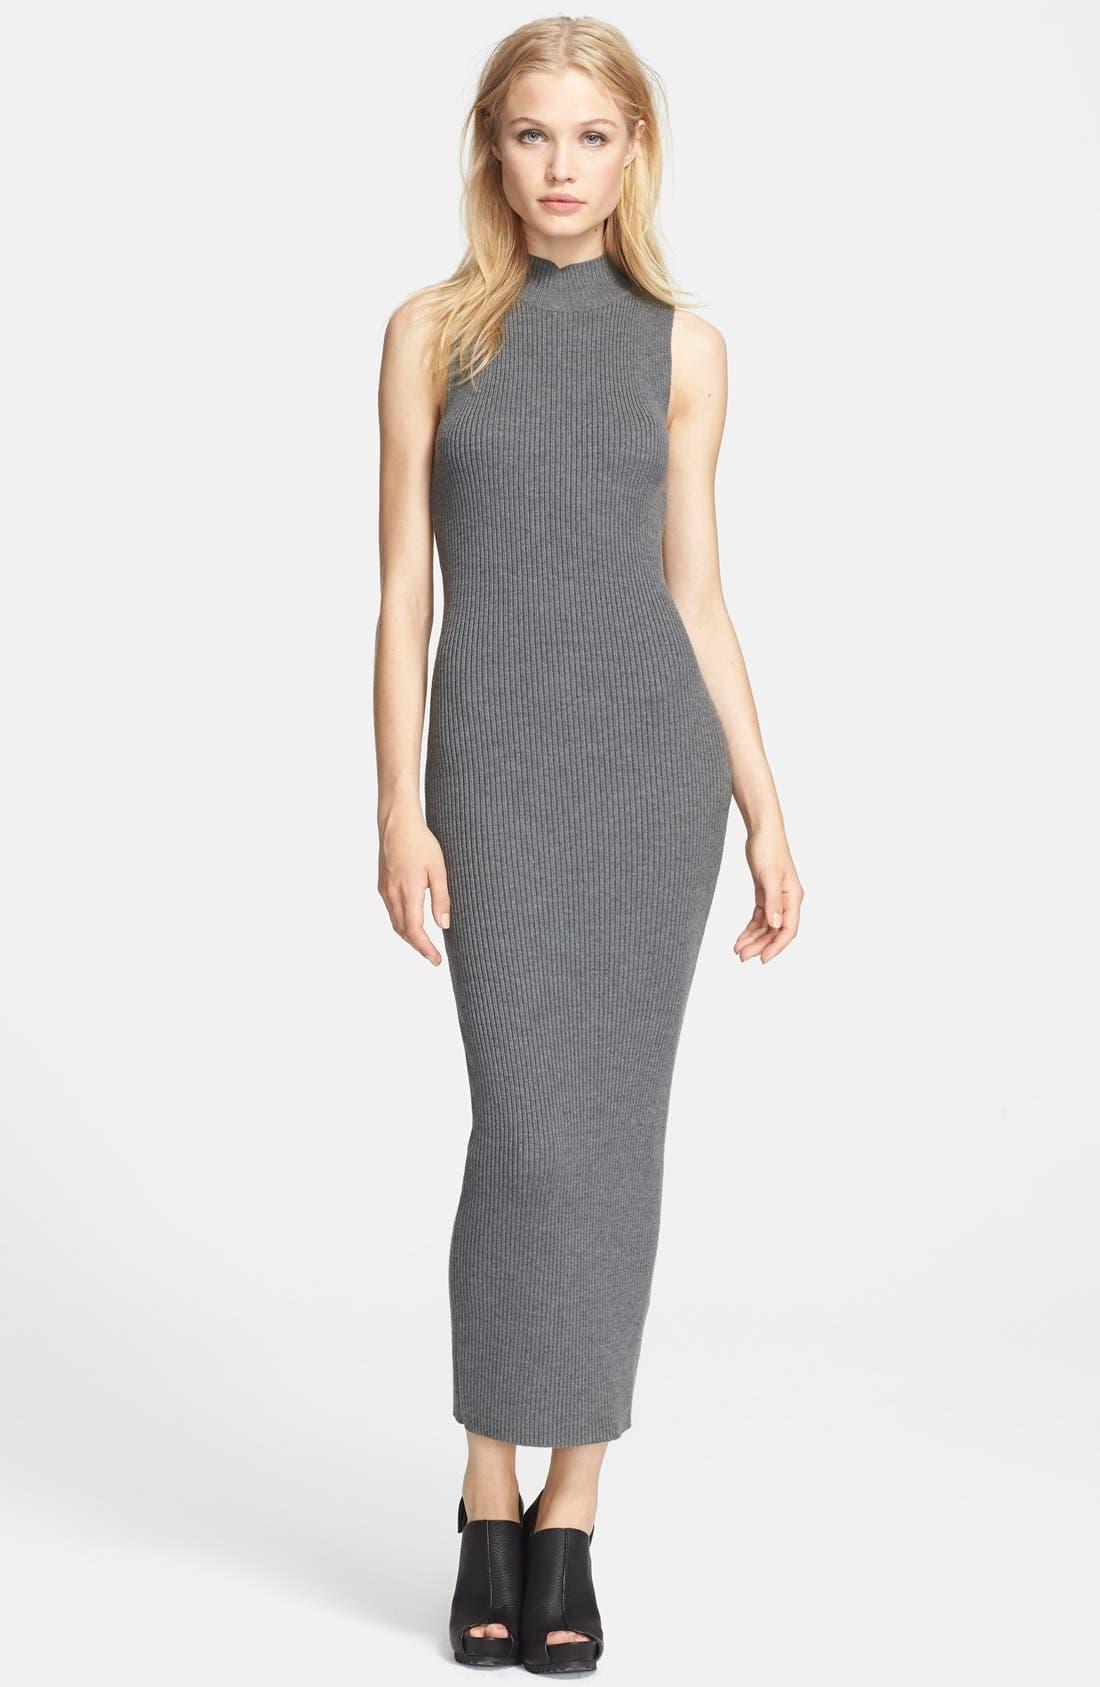 Alternate Image 1 Selected - Theory 'Ulana' Stretch Knit Sweater Dress